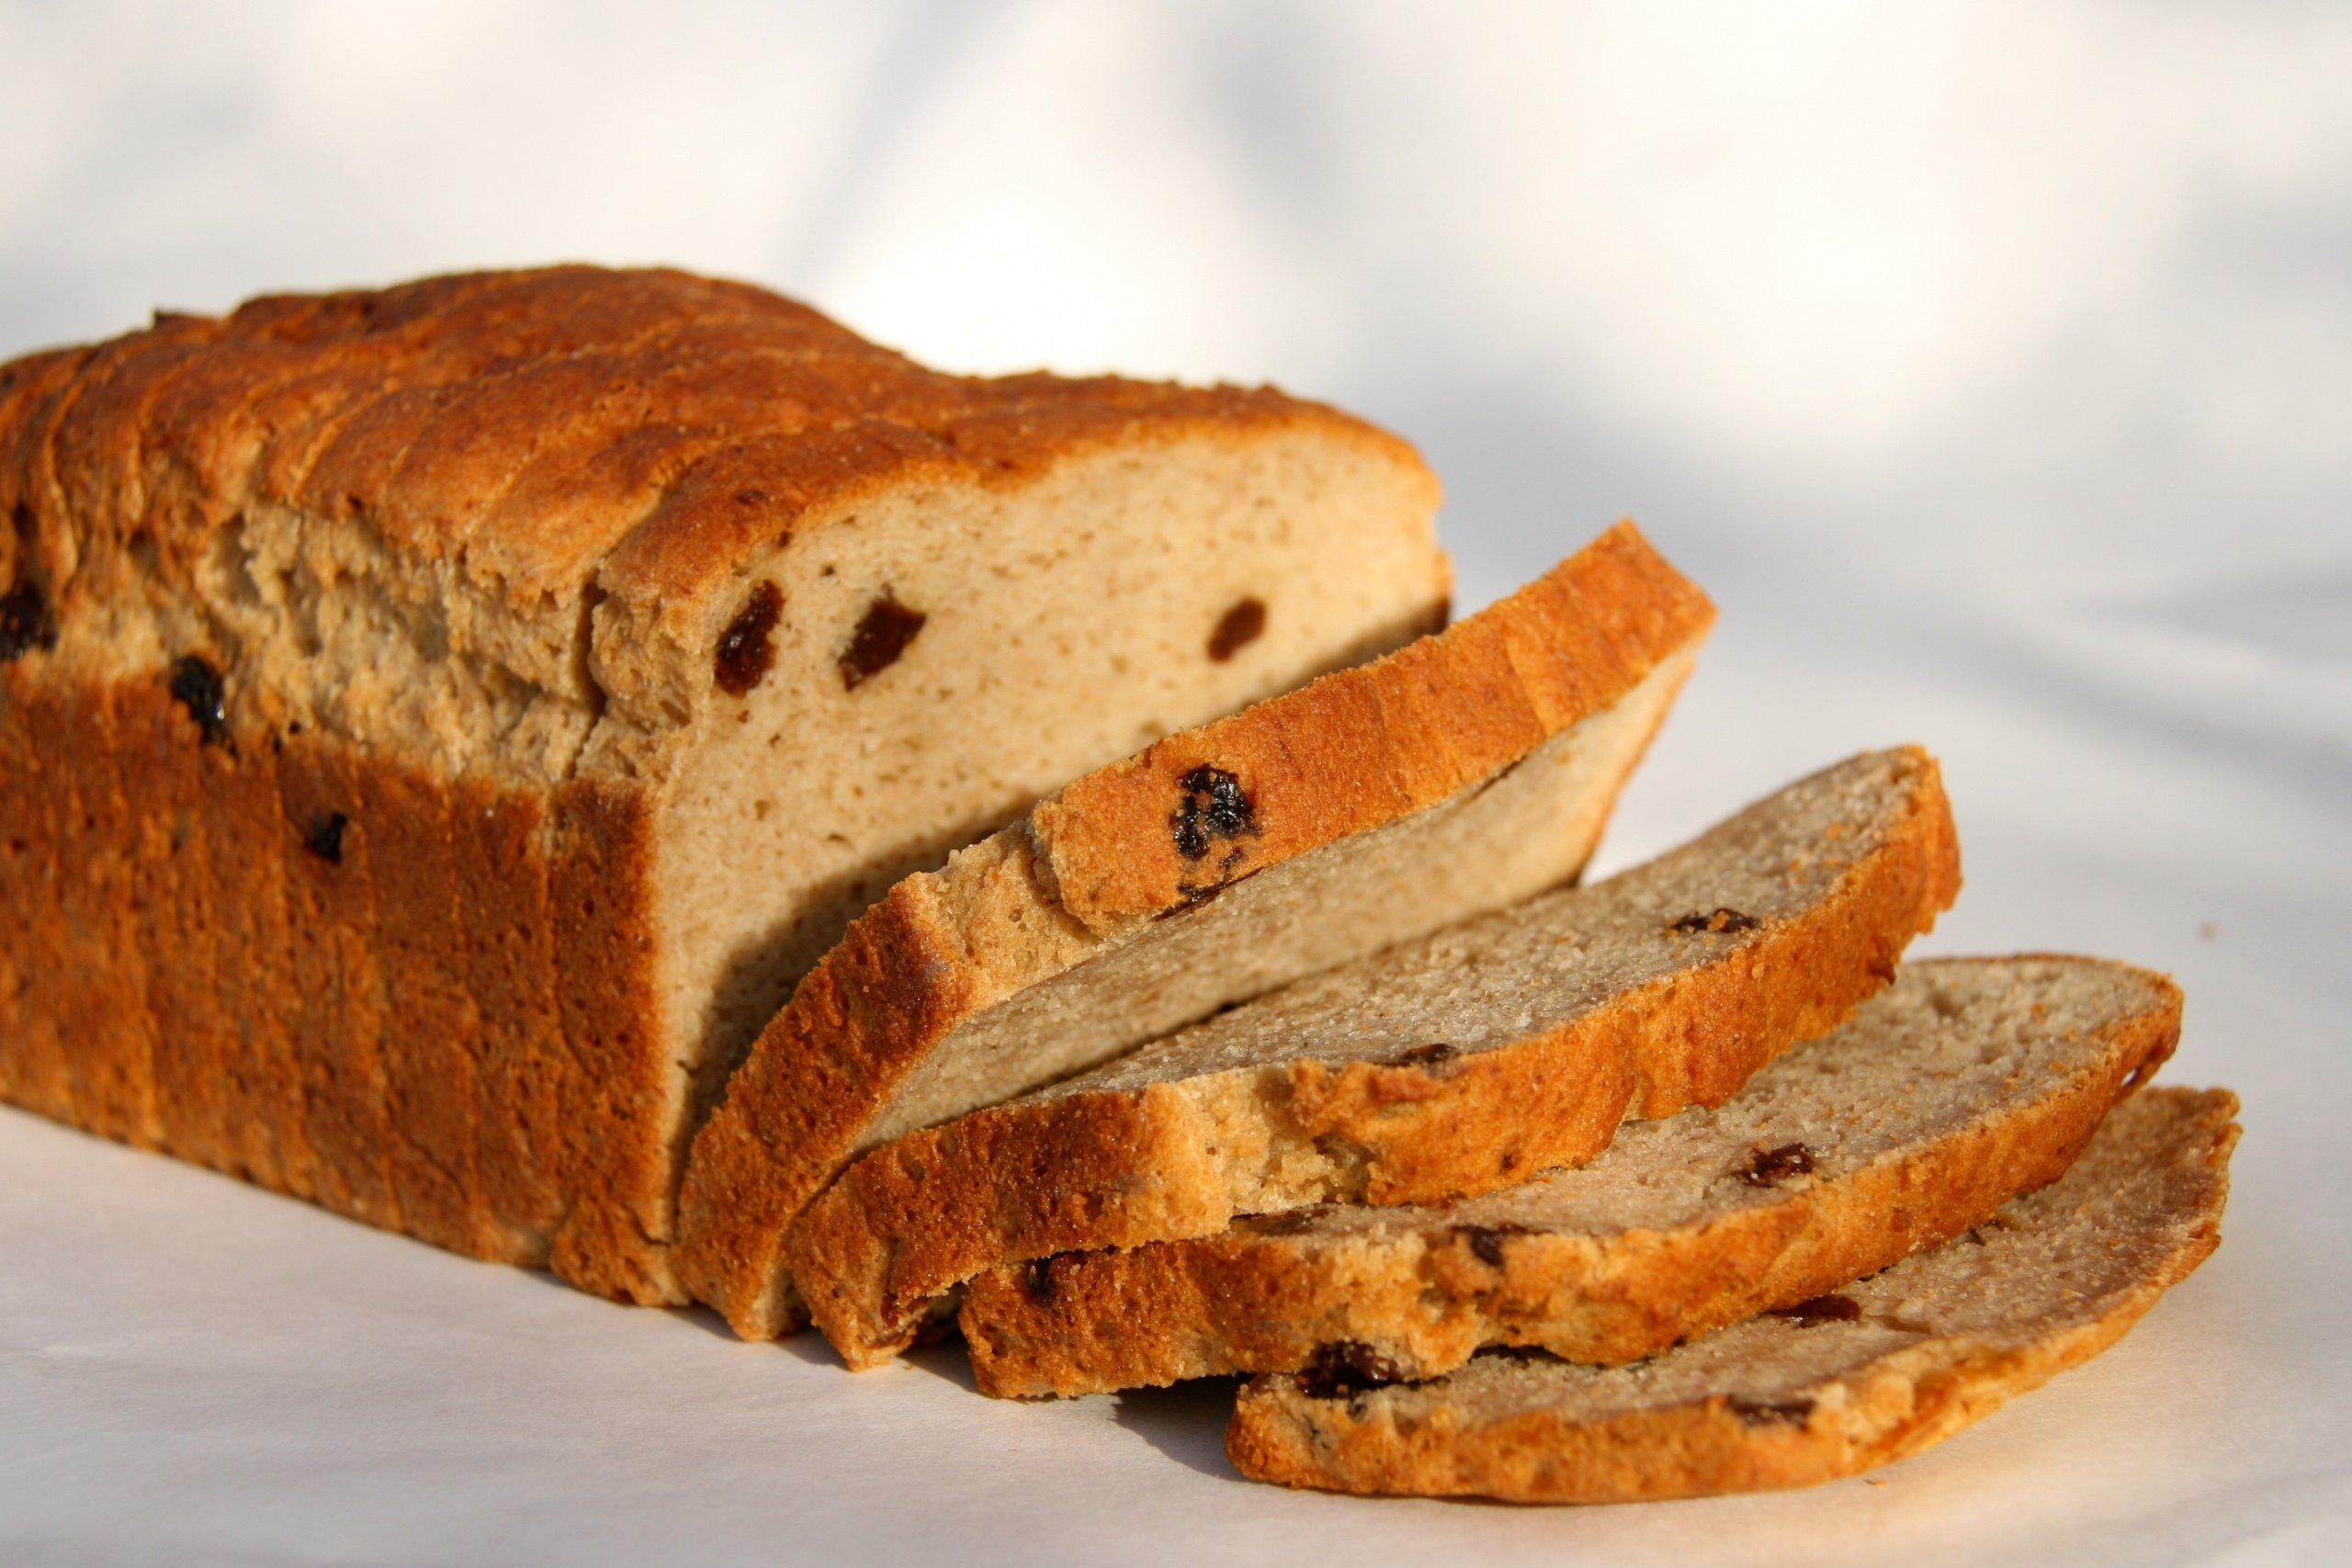 New Grains Gluten Free Cinnamon Raisin Bread, 32 oz Loaf